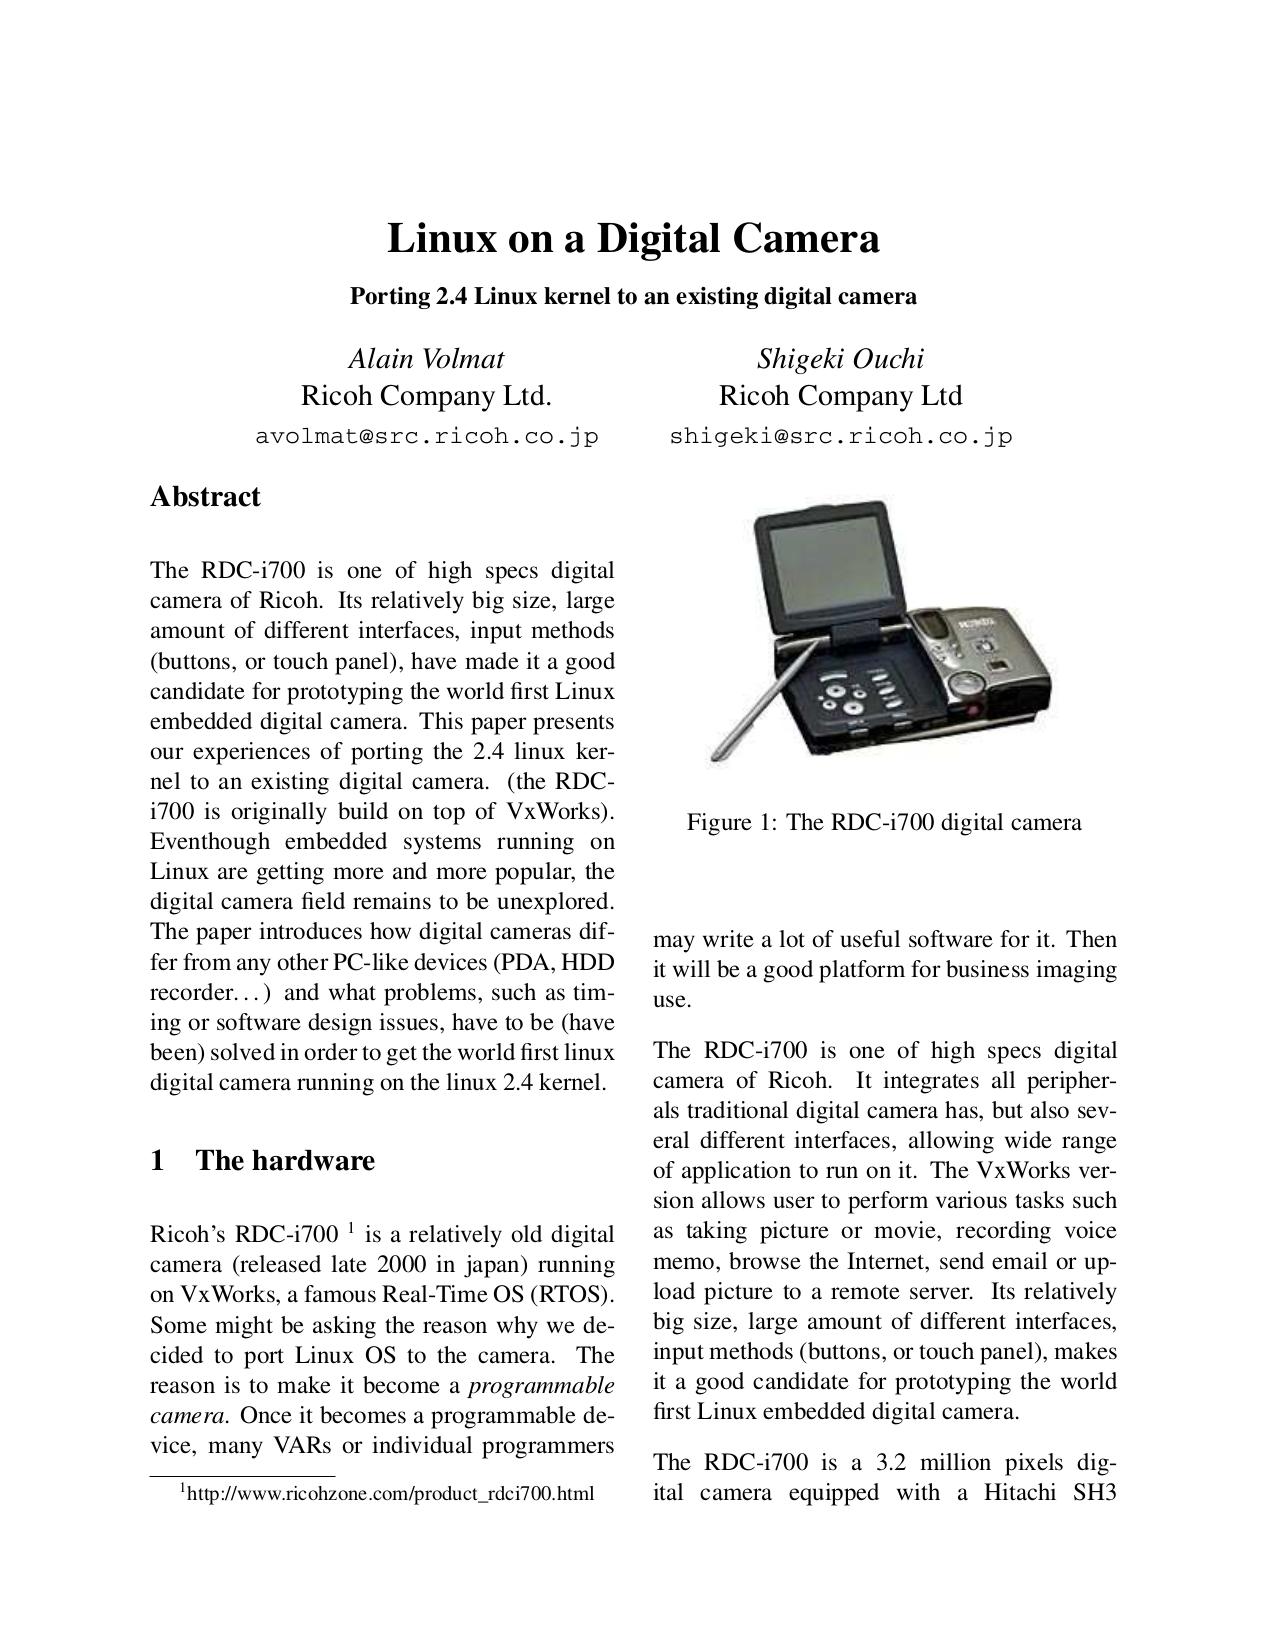 Download free pdf for Ricoh RDC-i700 Digital Camera manual